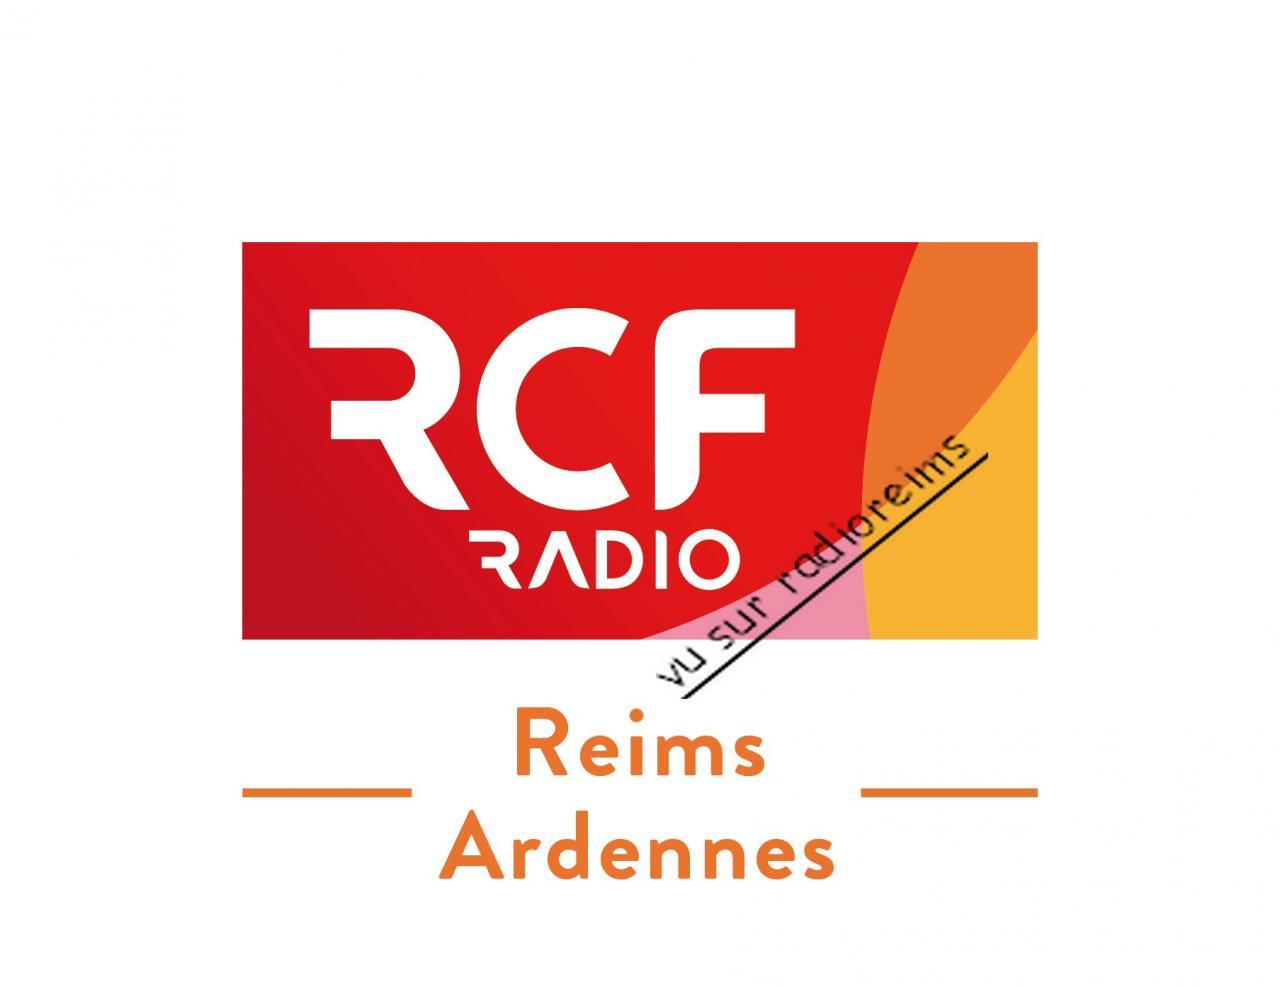 Logo RCF RA 2015